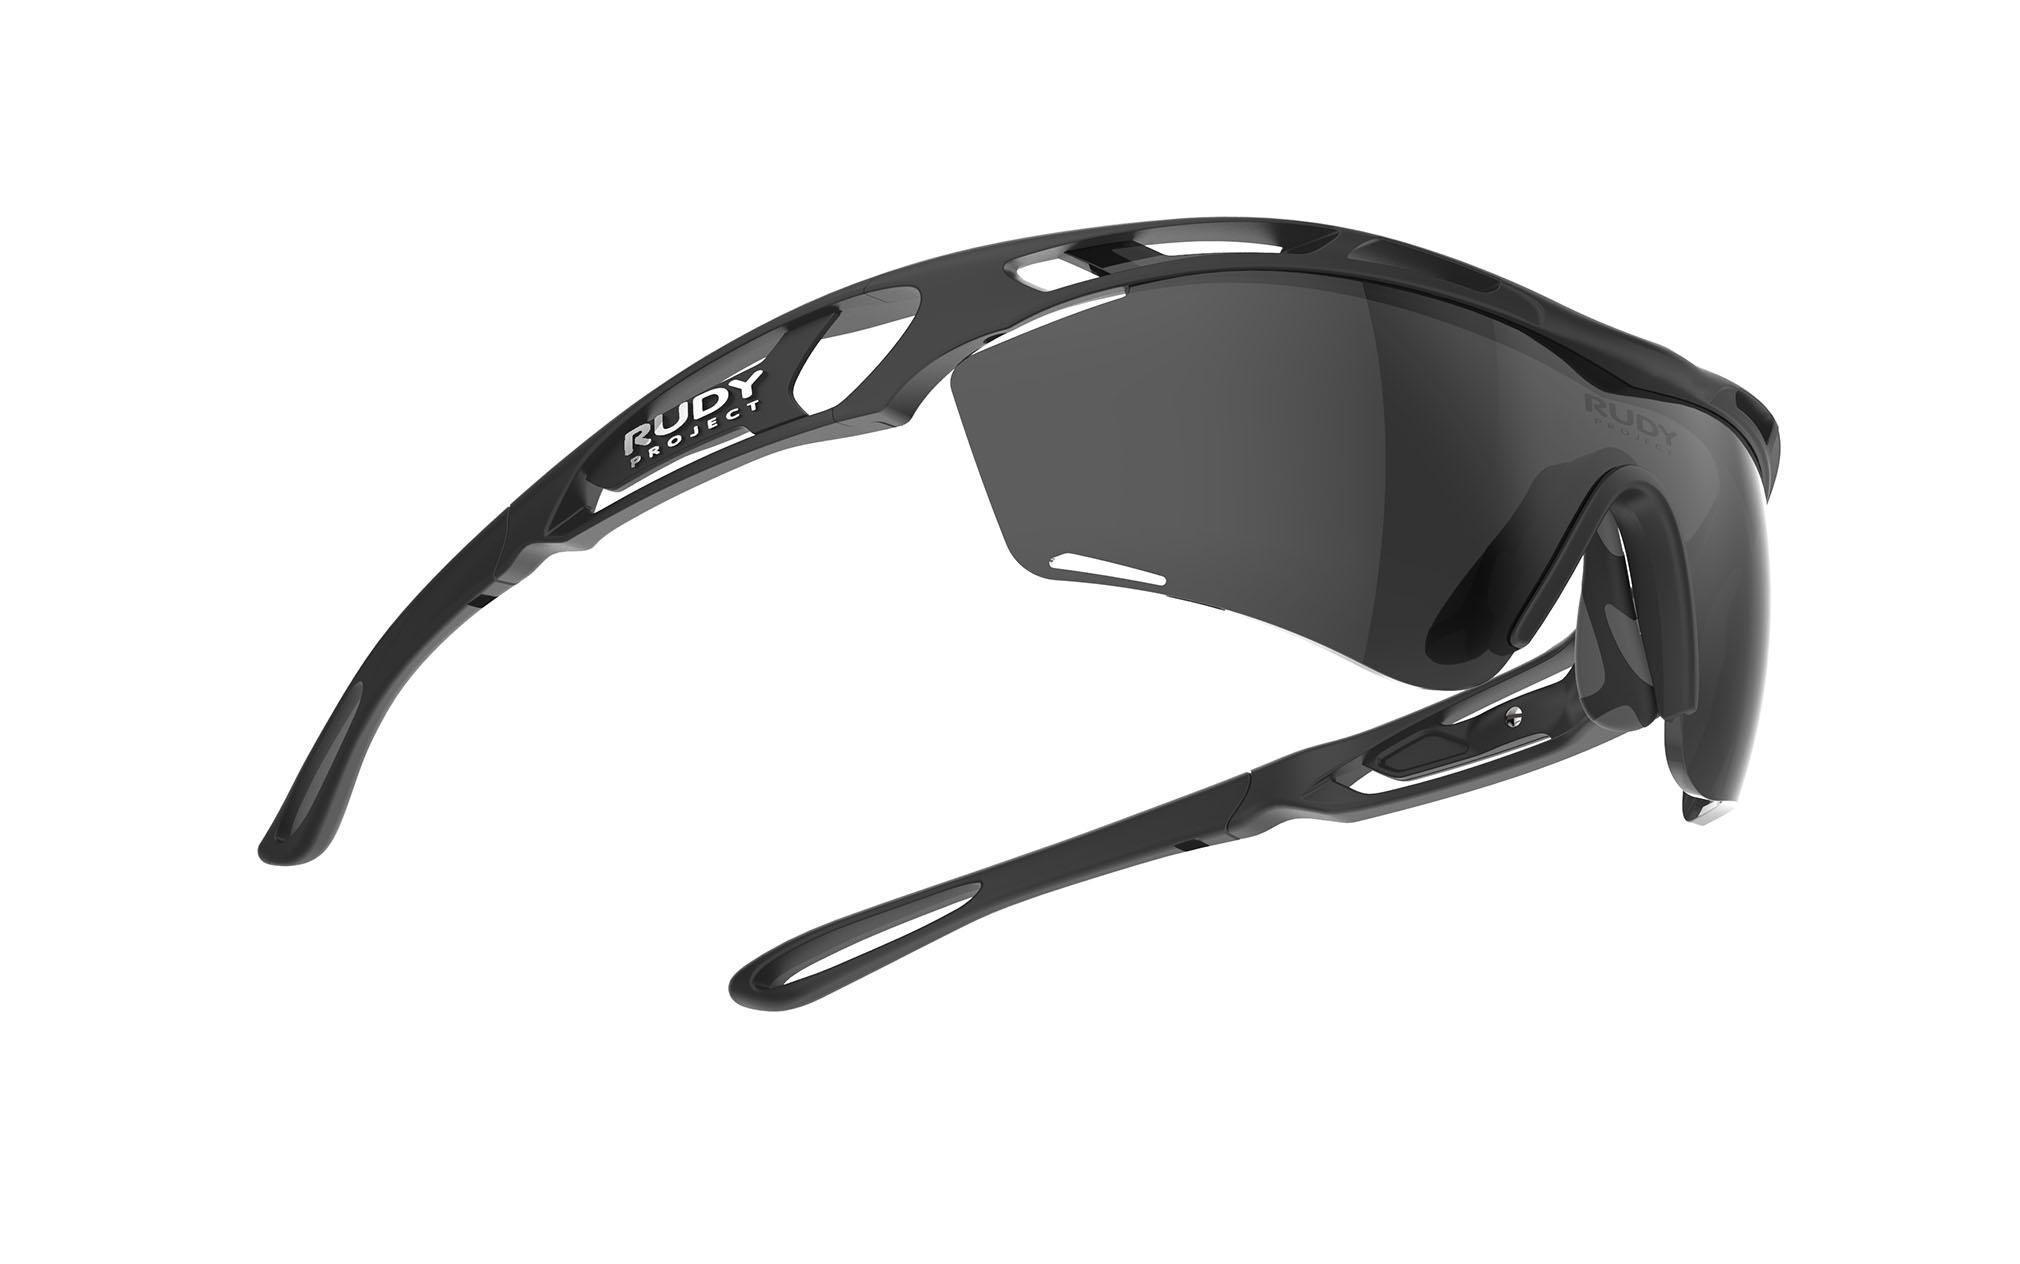 22dbf411c9e Performance Eyewear Tralyx Slim - Rudy Project